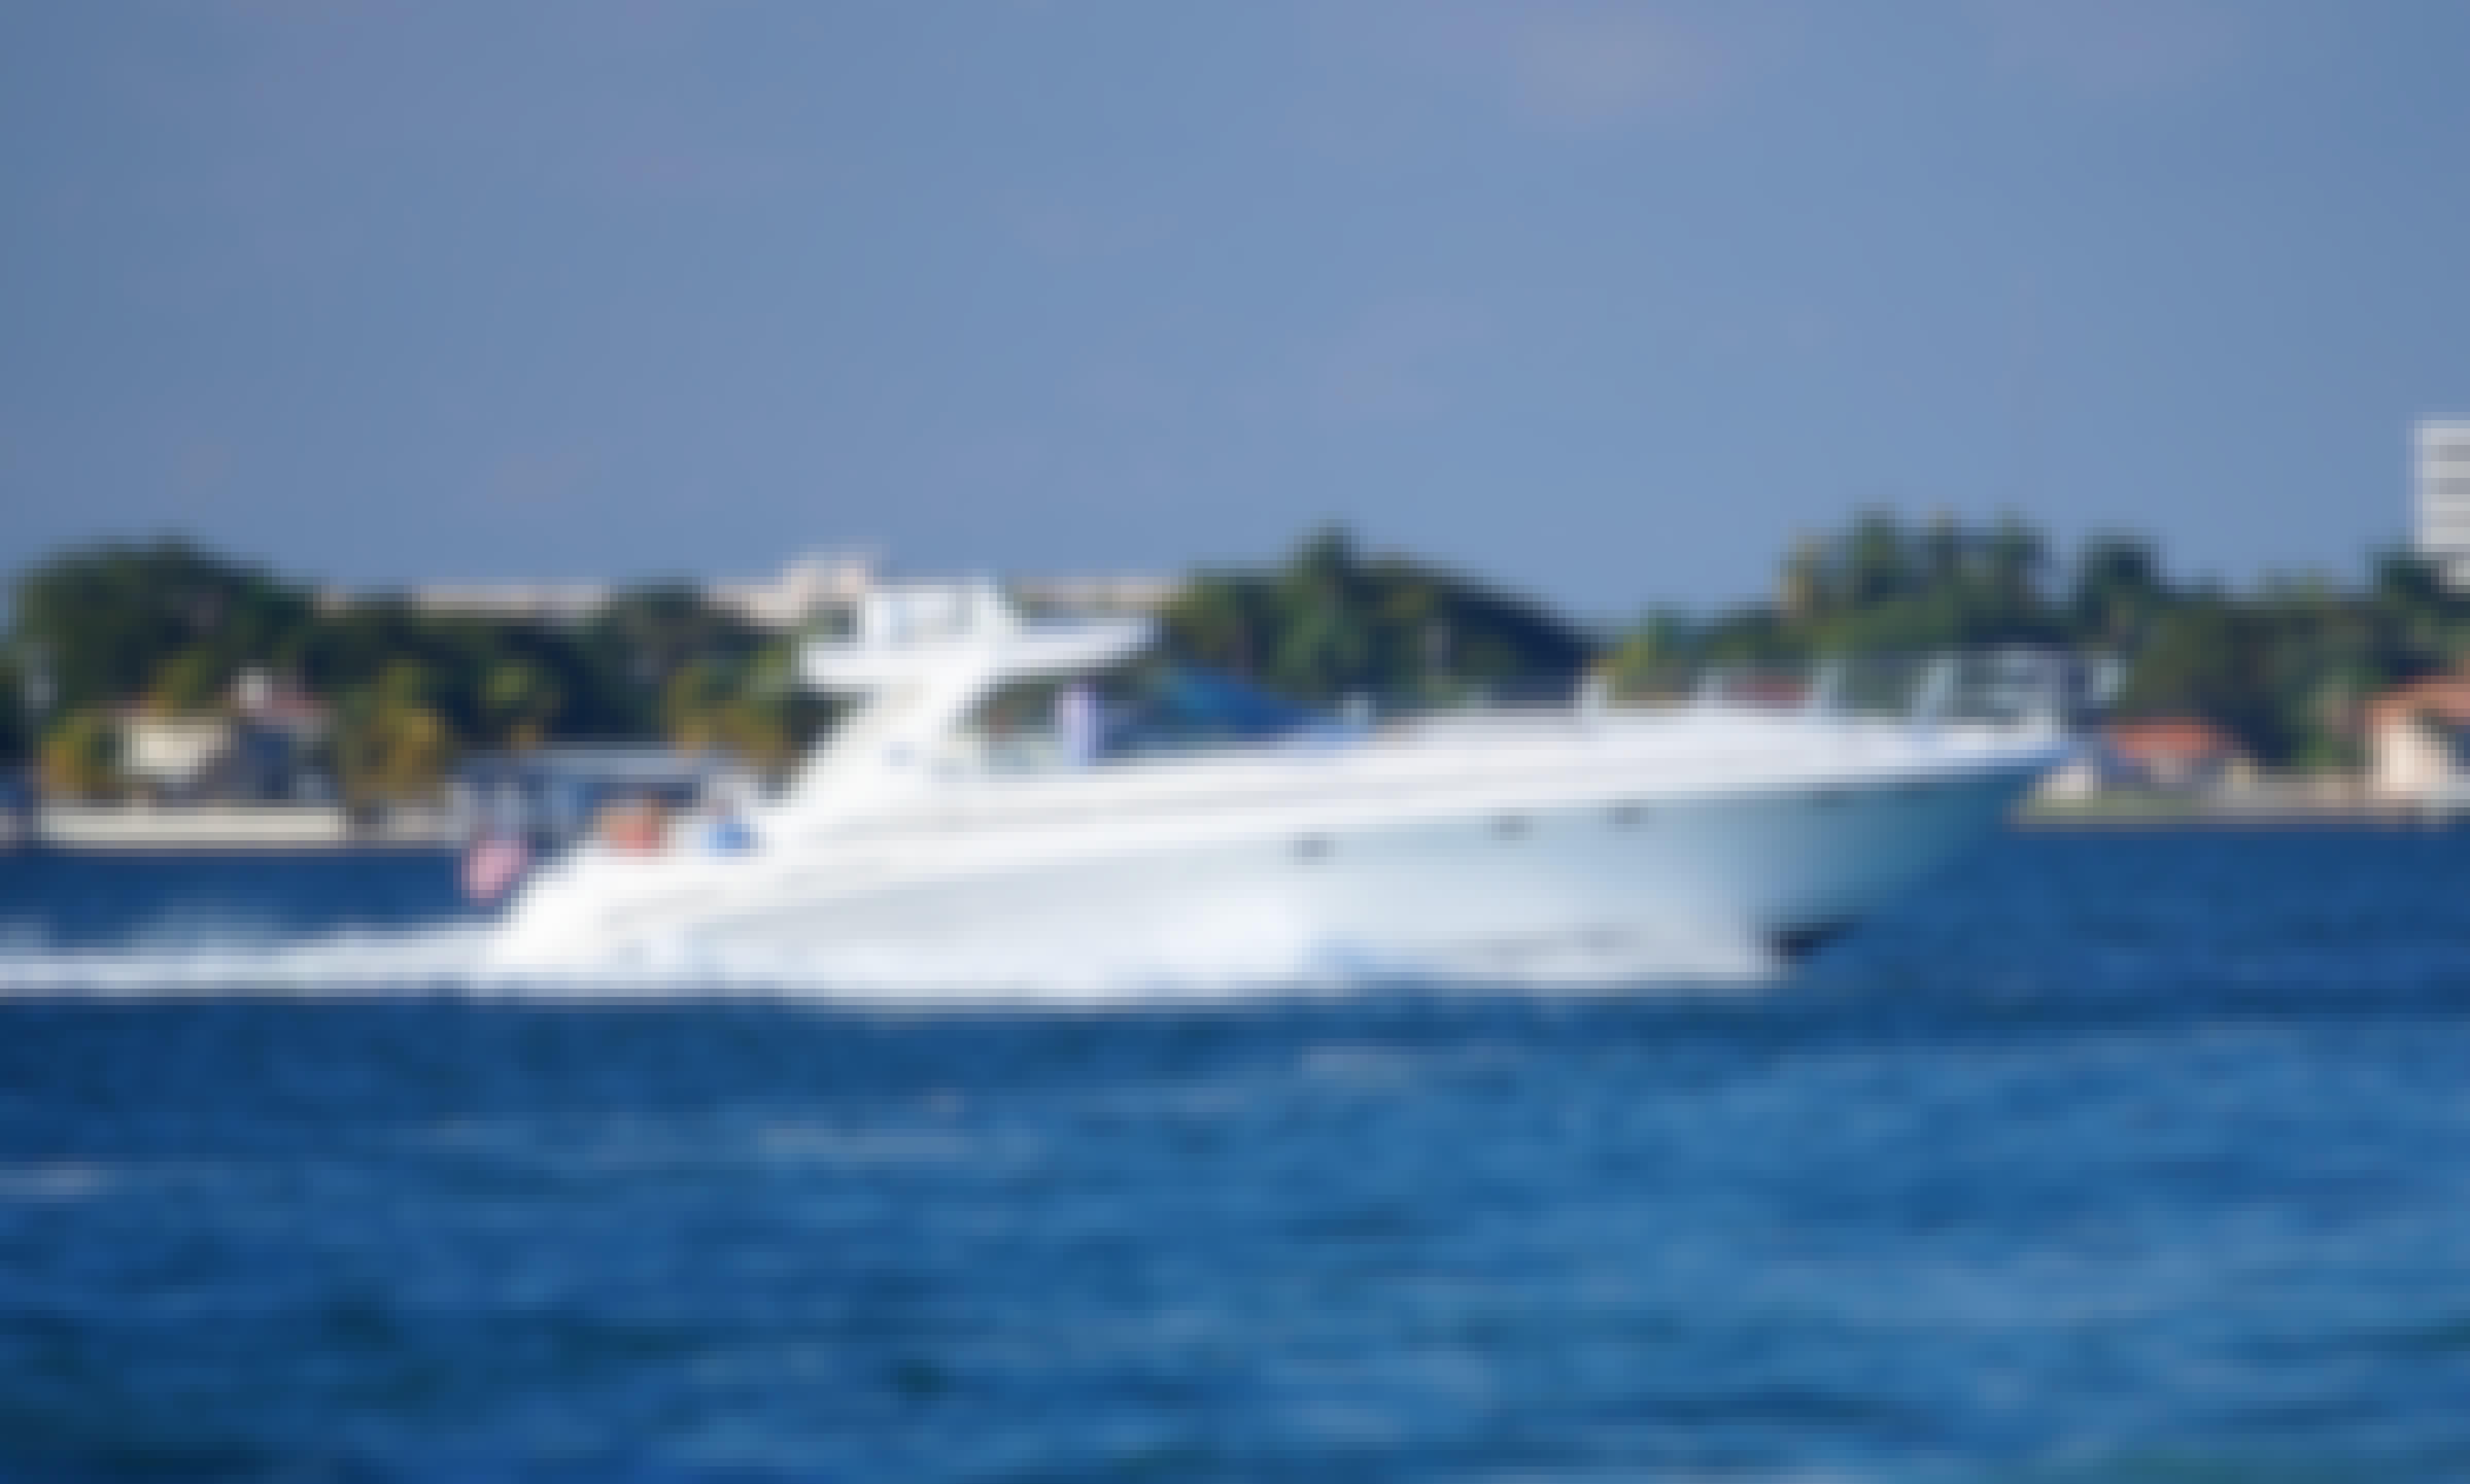 SeaRay 55 Motor Yacht Charter in North Bay Village, Florida